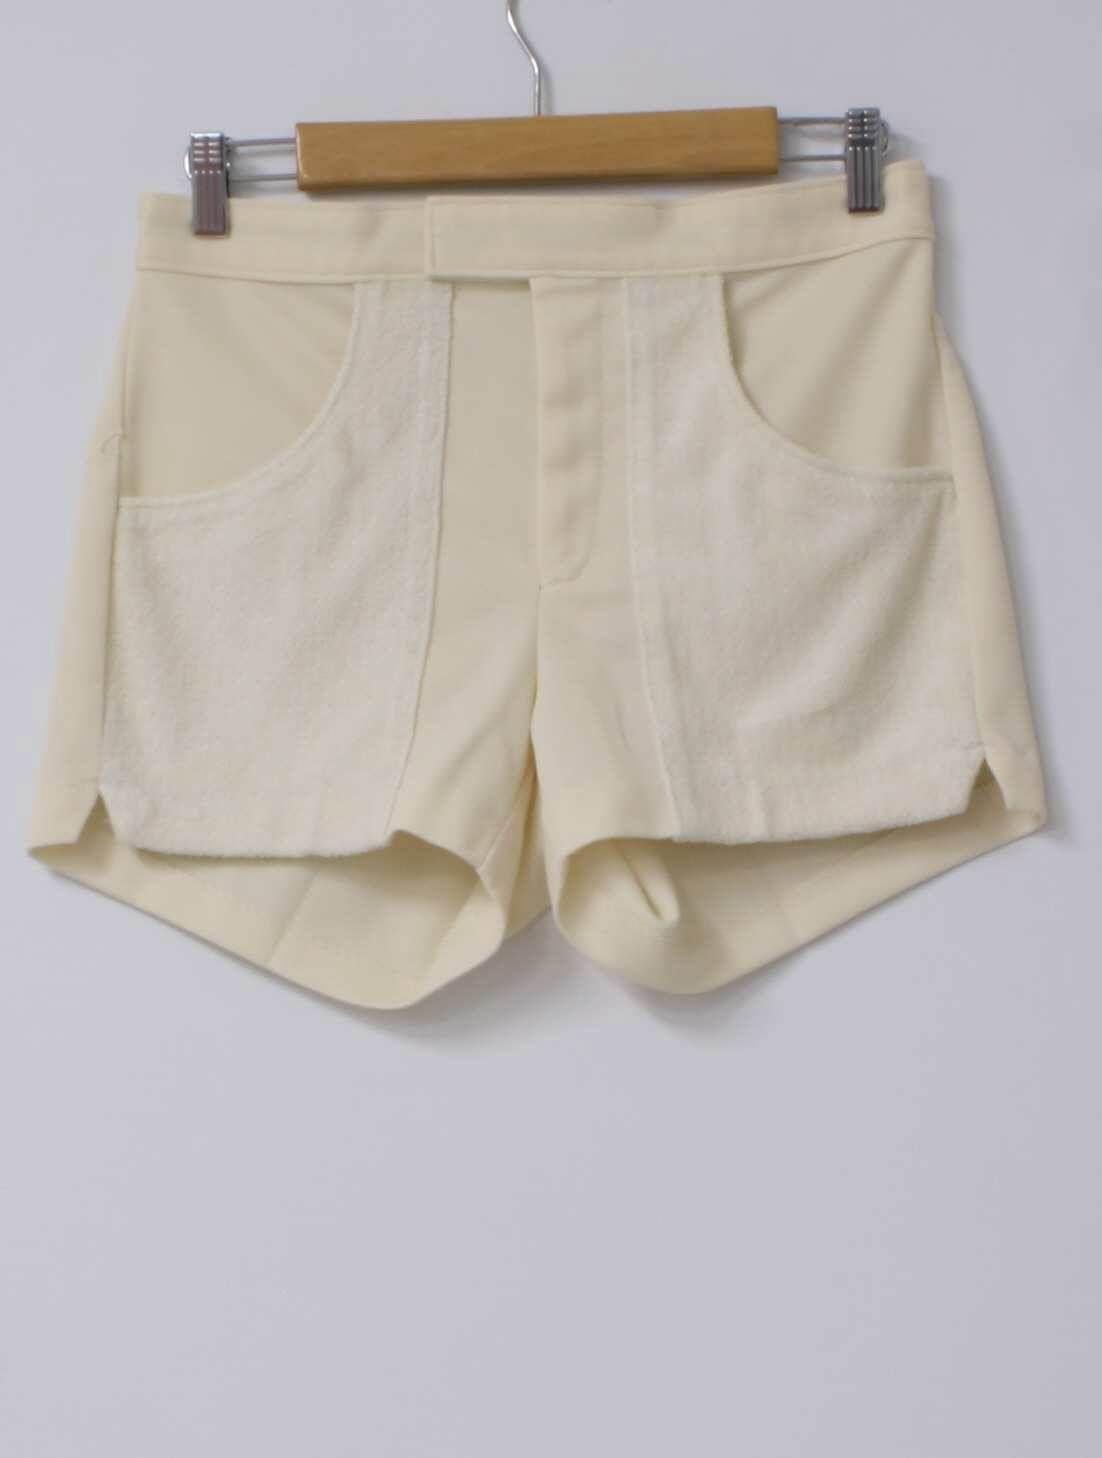 Rustyzipper Com Vintage Clothing Tennis Shorts Vintage Outfits Shorts